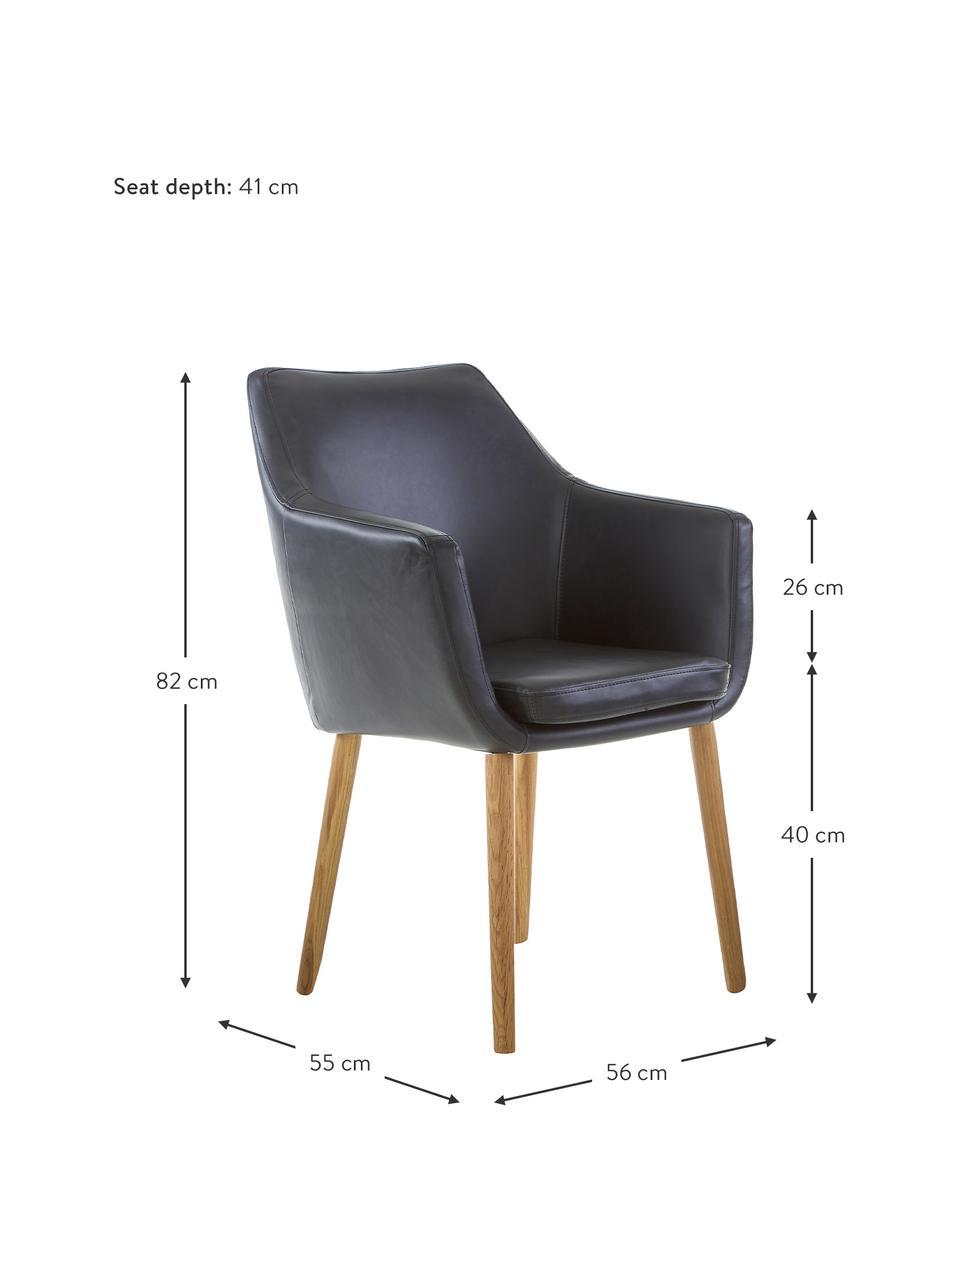 Kunstleder-Armlehnstuhl Nora mit Holzbeine, Bezug: Kunstleder (Polyurethan) , Beine: Eichenholz, Kunstleder Schwarz, B 56 x T 55 cm